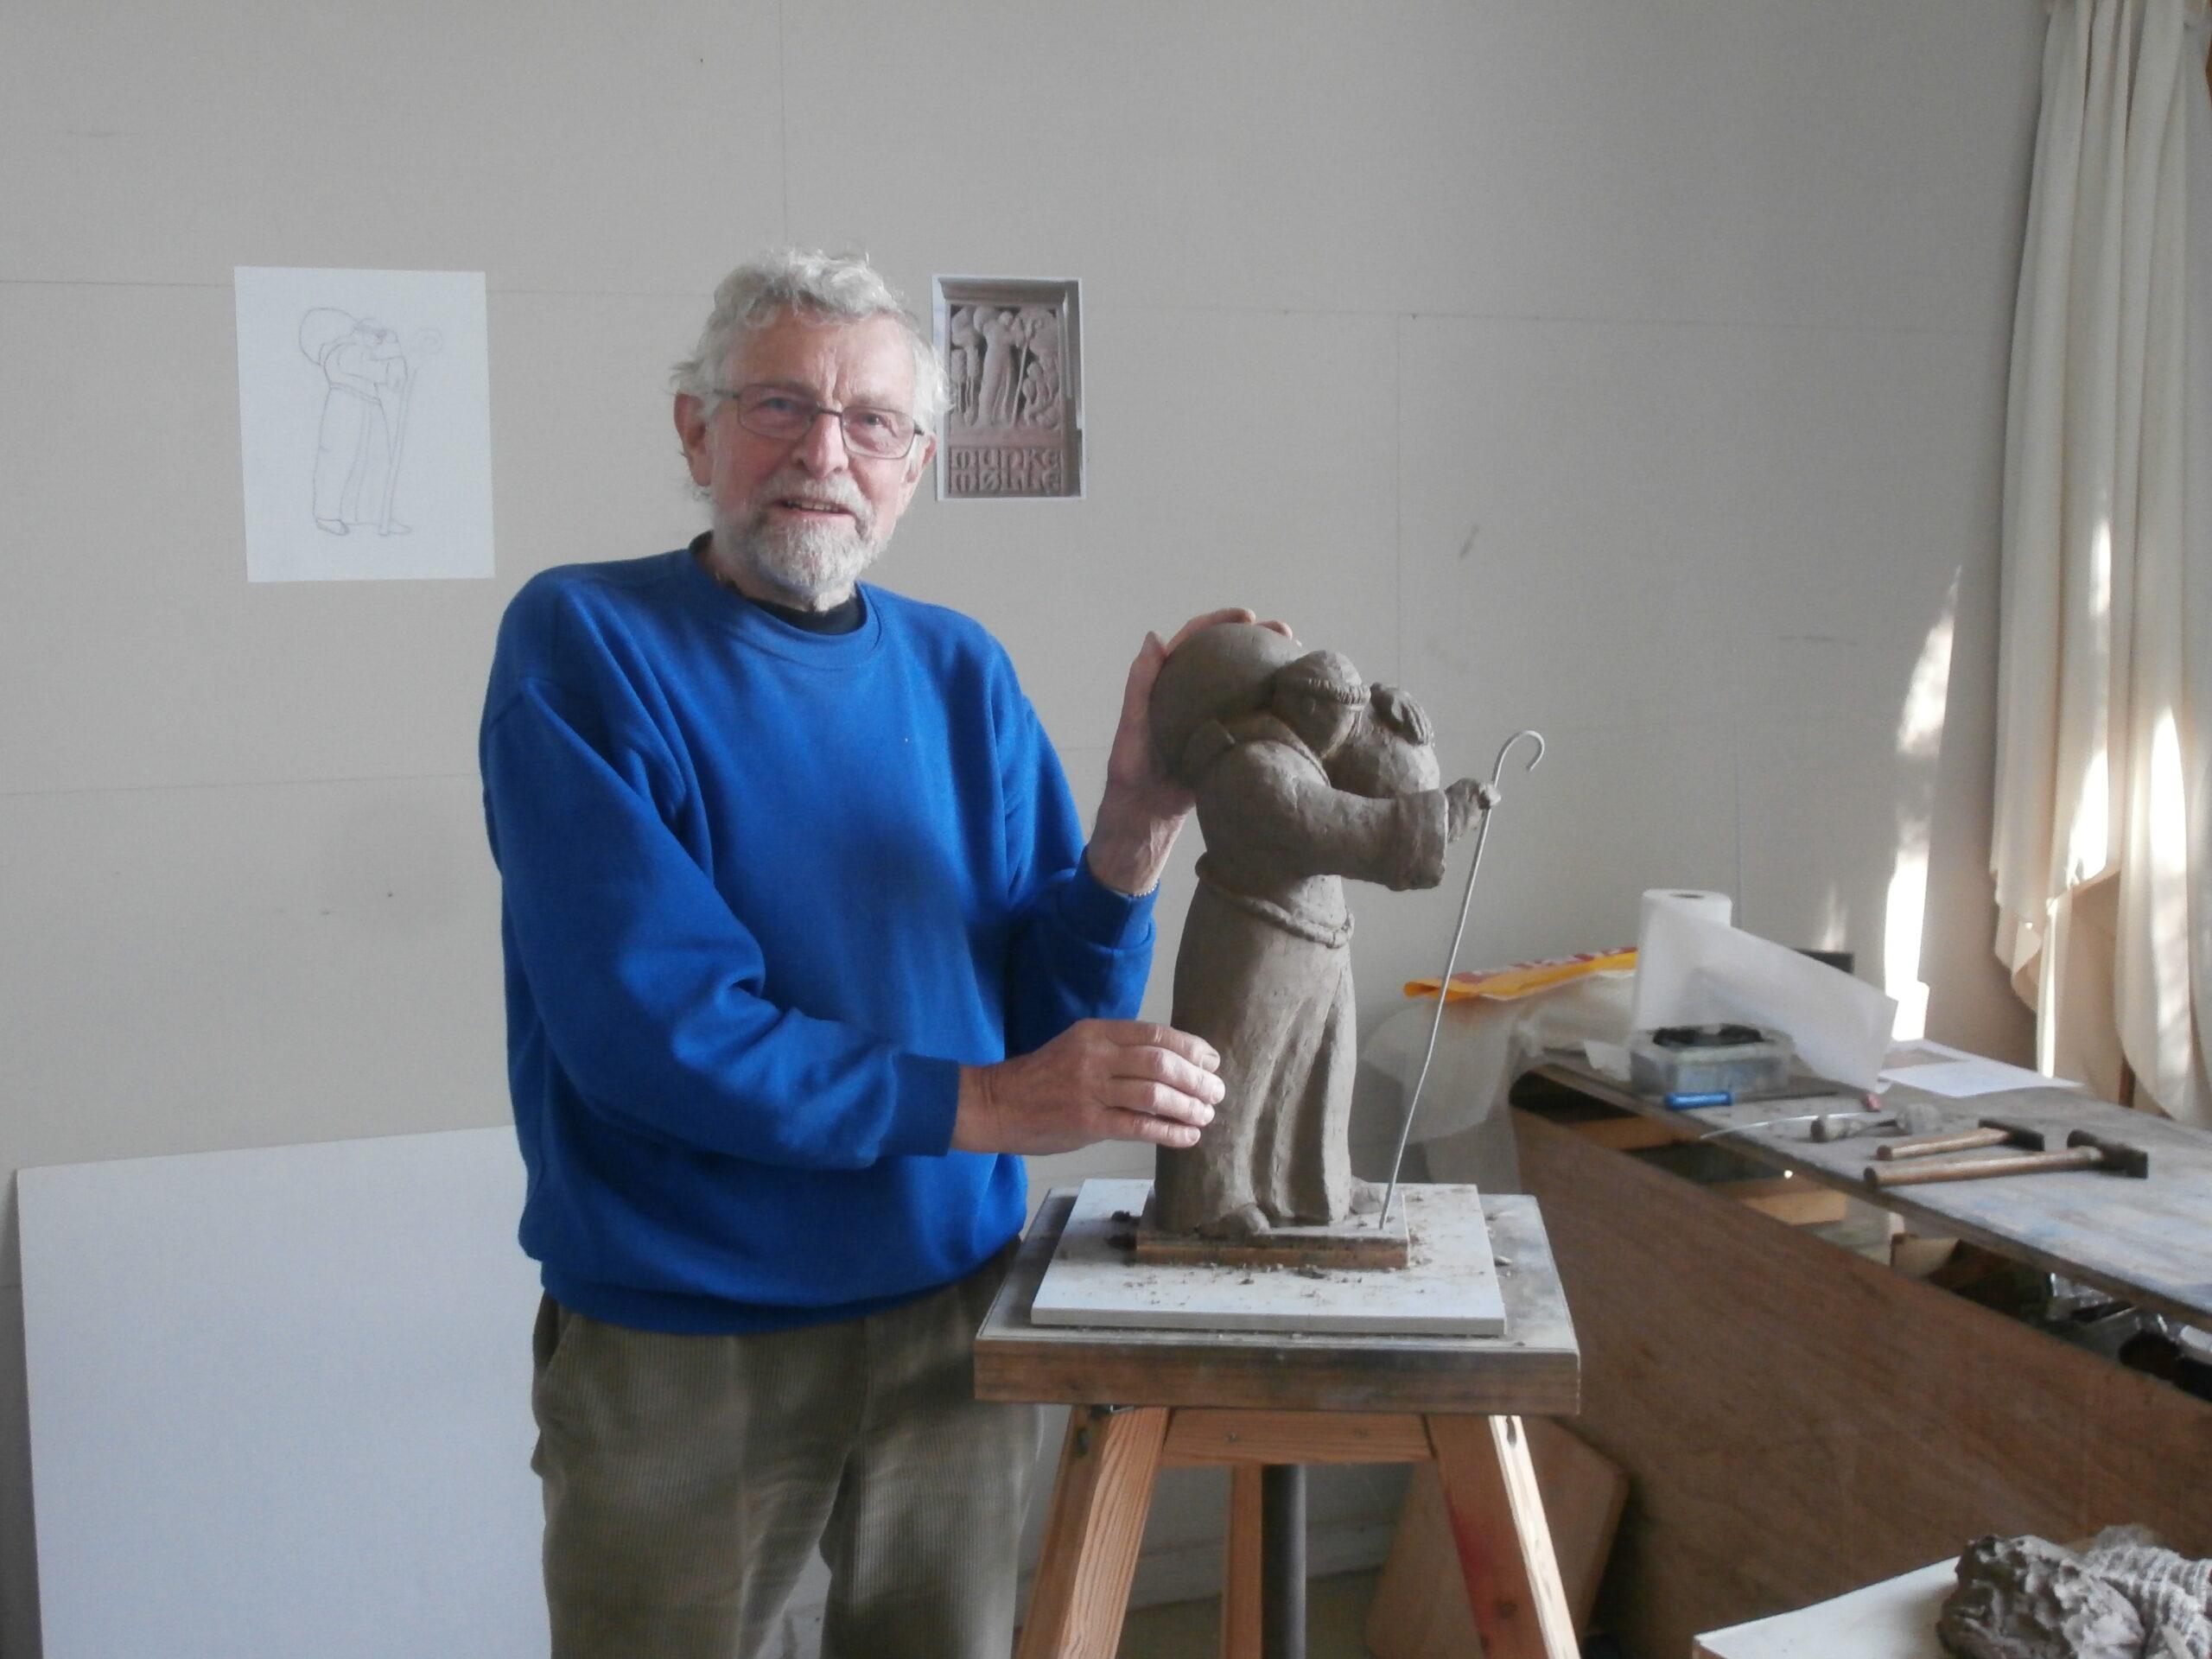 model af munkeskulptur til Munkemølle 2017